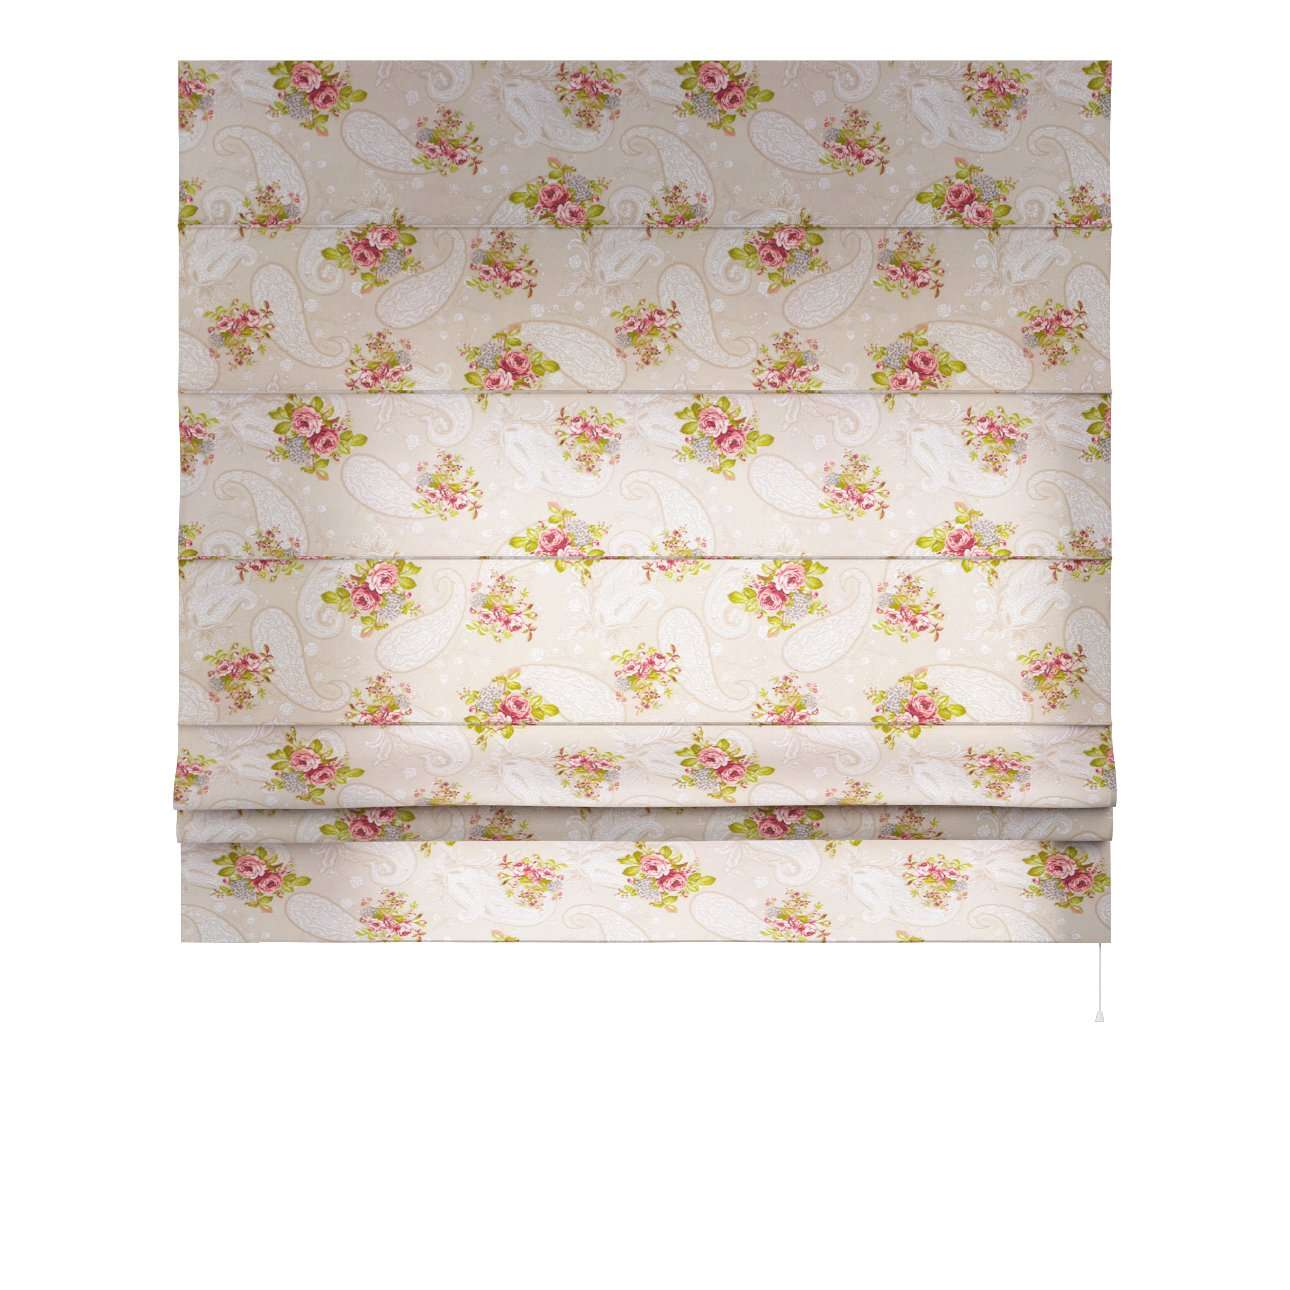 Rímska roleta Padva V kolekcii Flowers, tkanina: 311-15